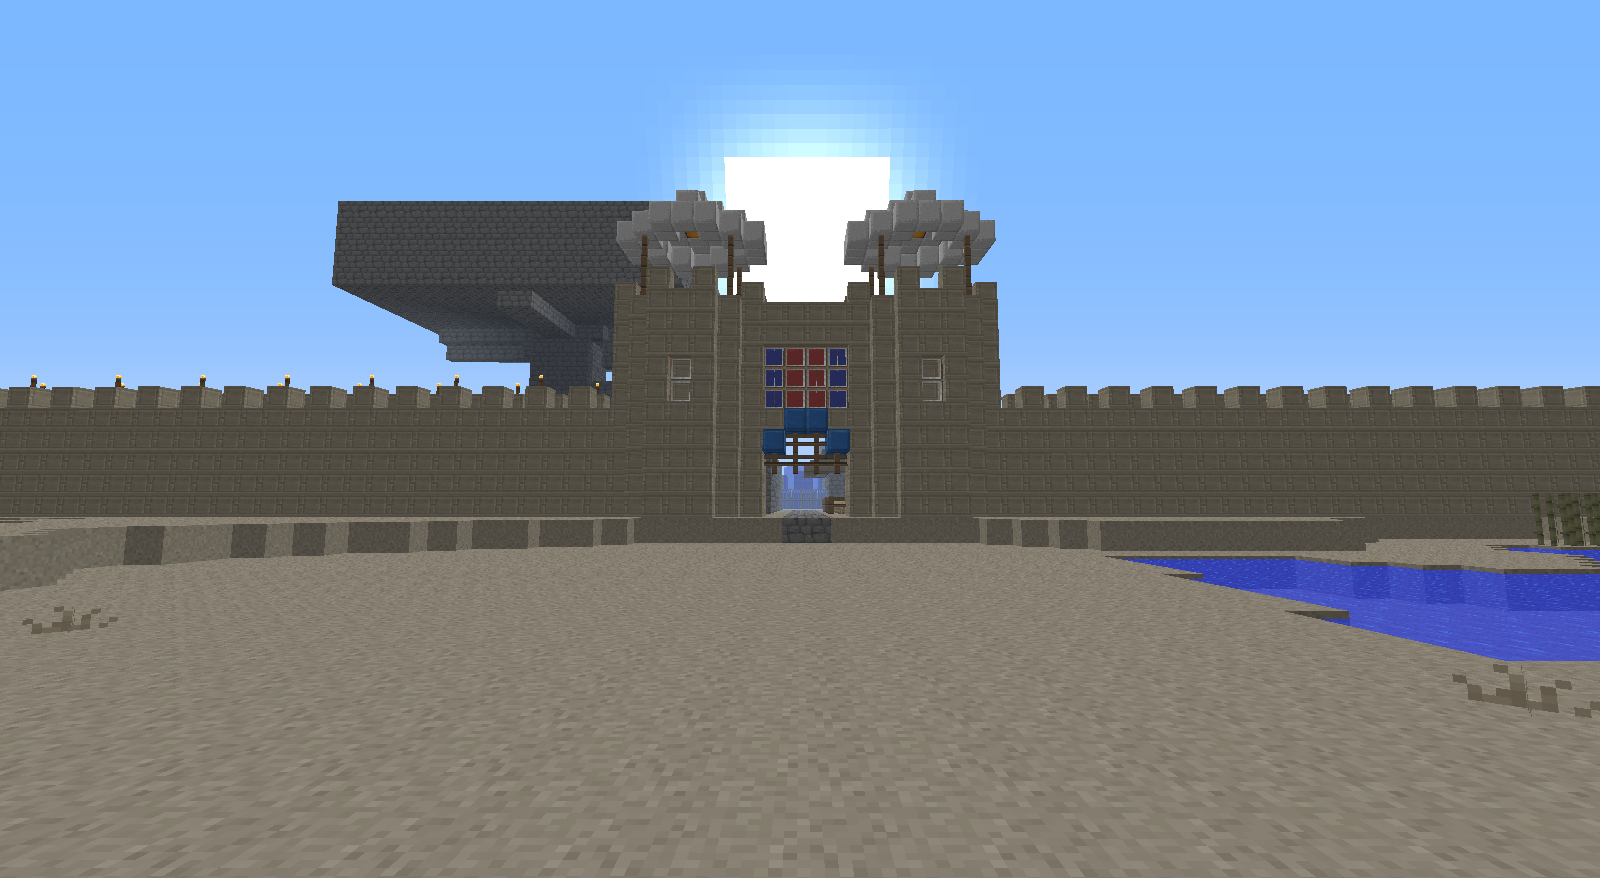 Ender_Goth's City Entrance